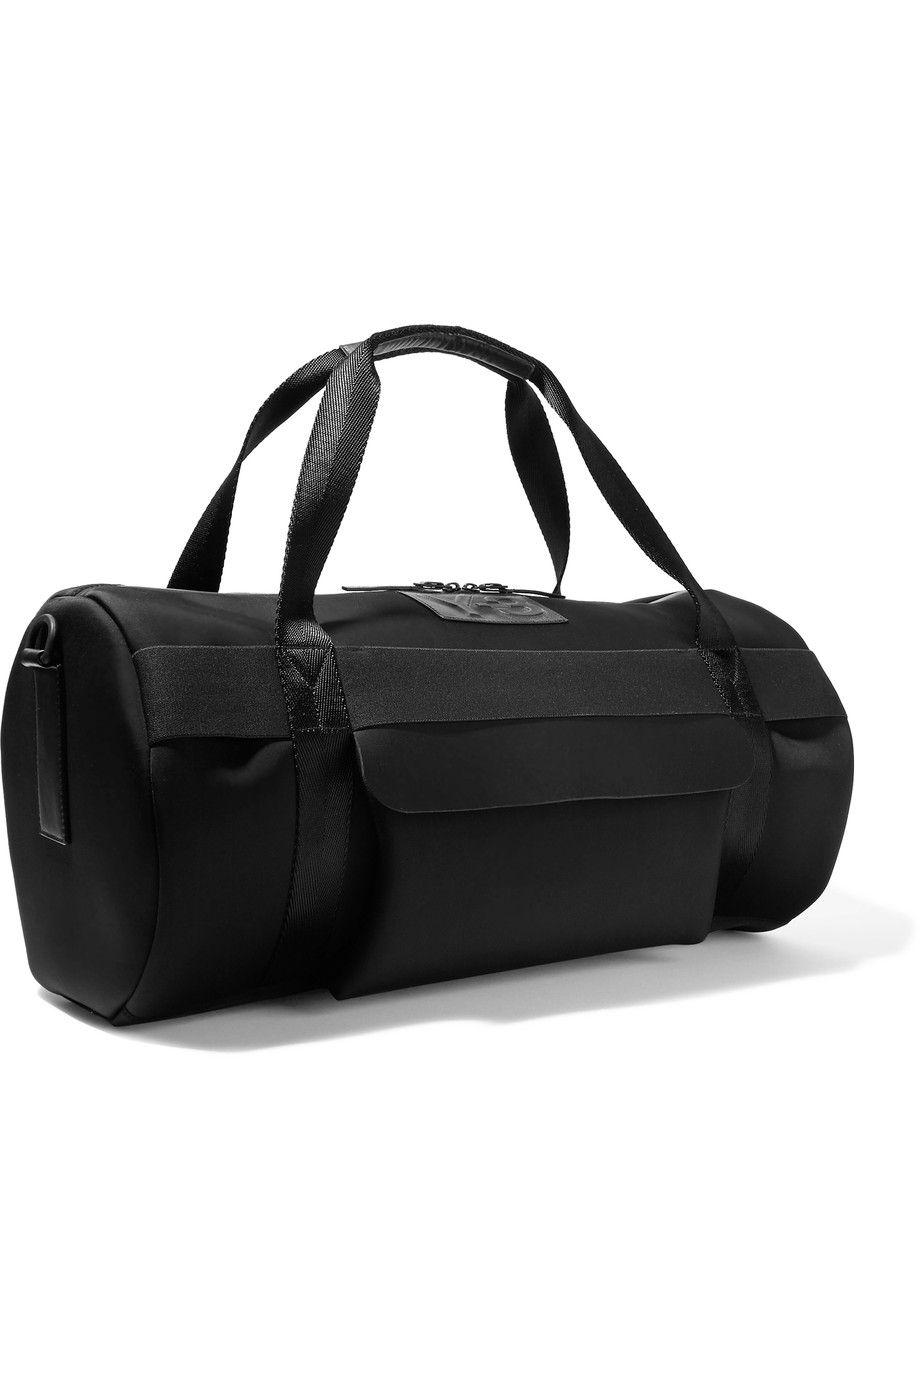 Y 3 Scuba Gym Bag